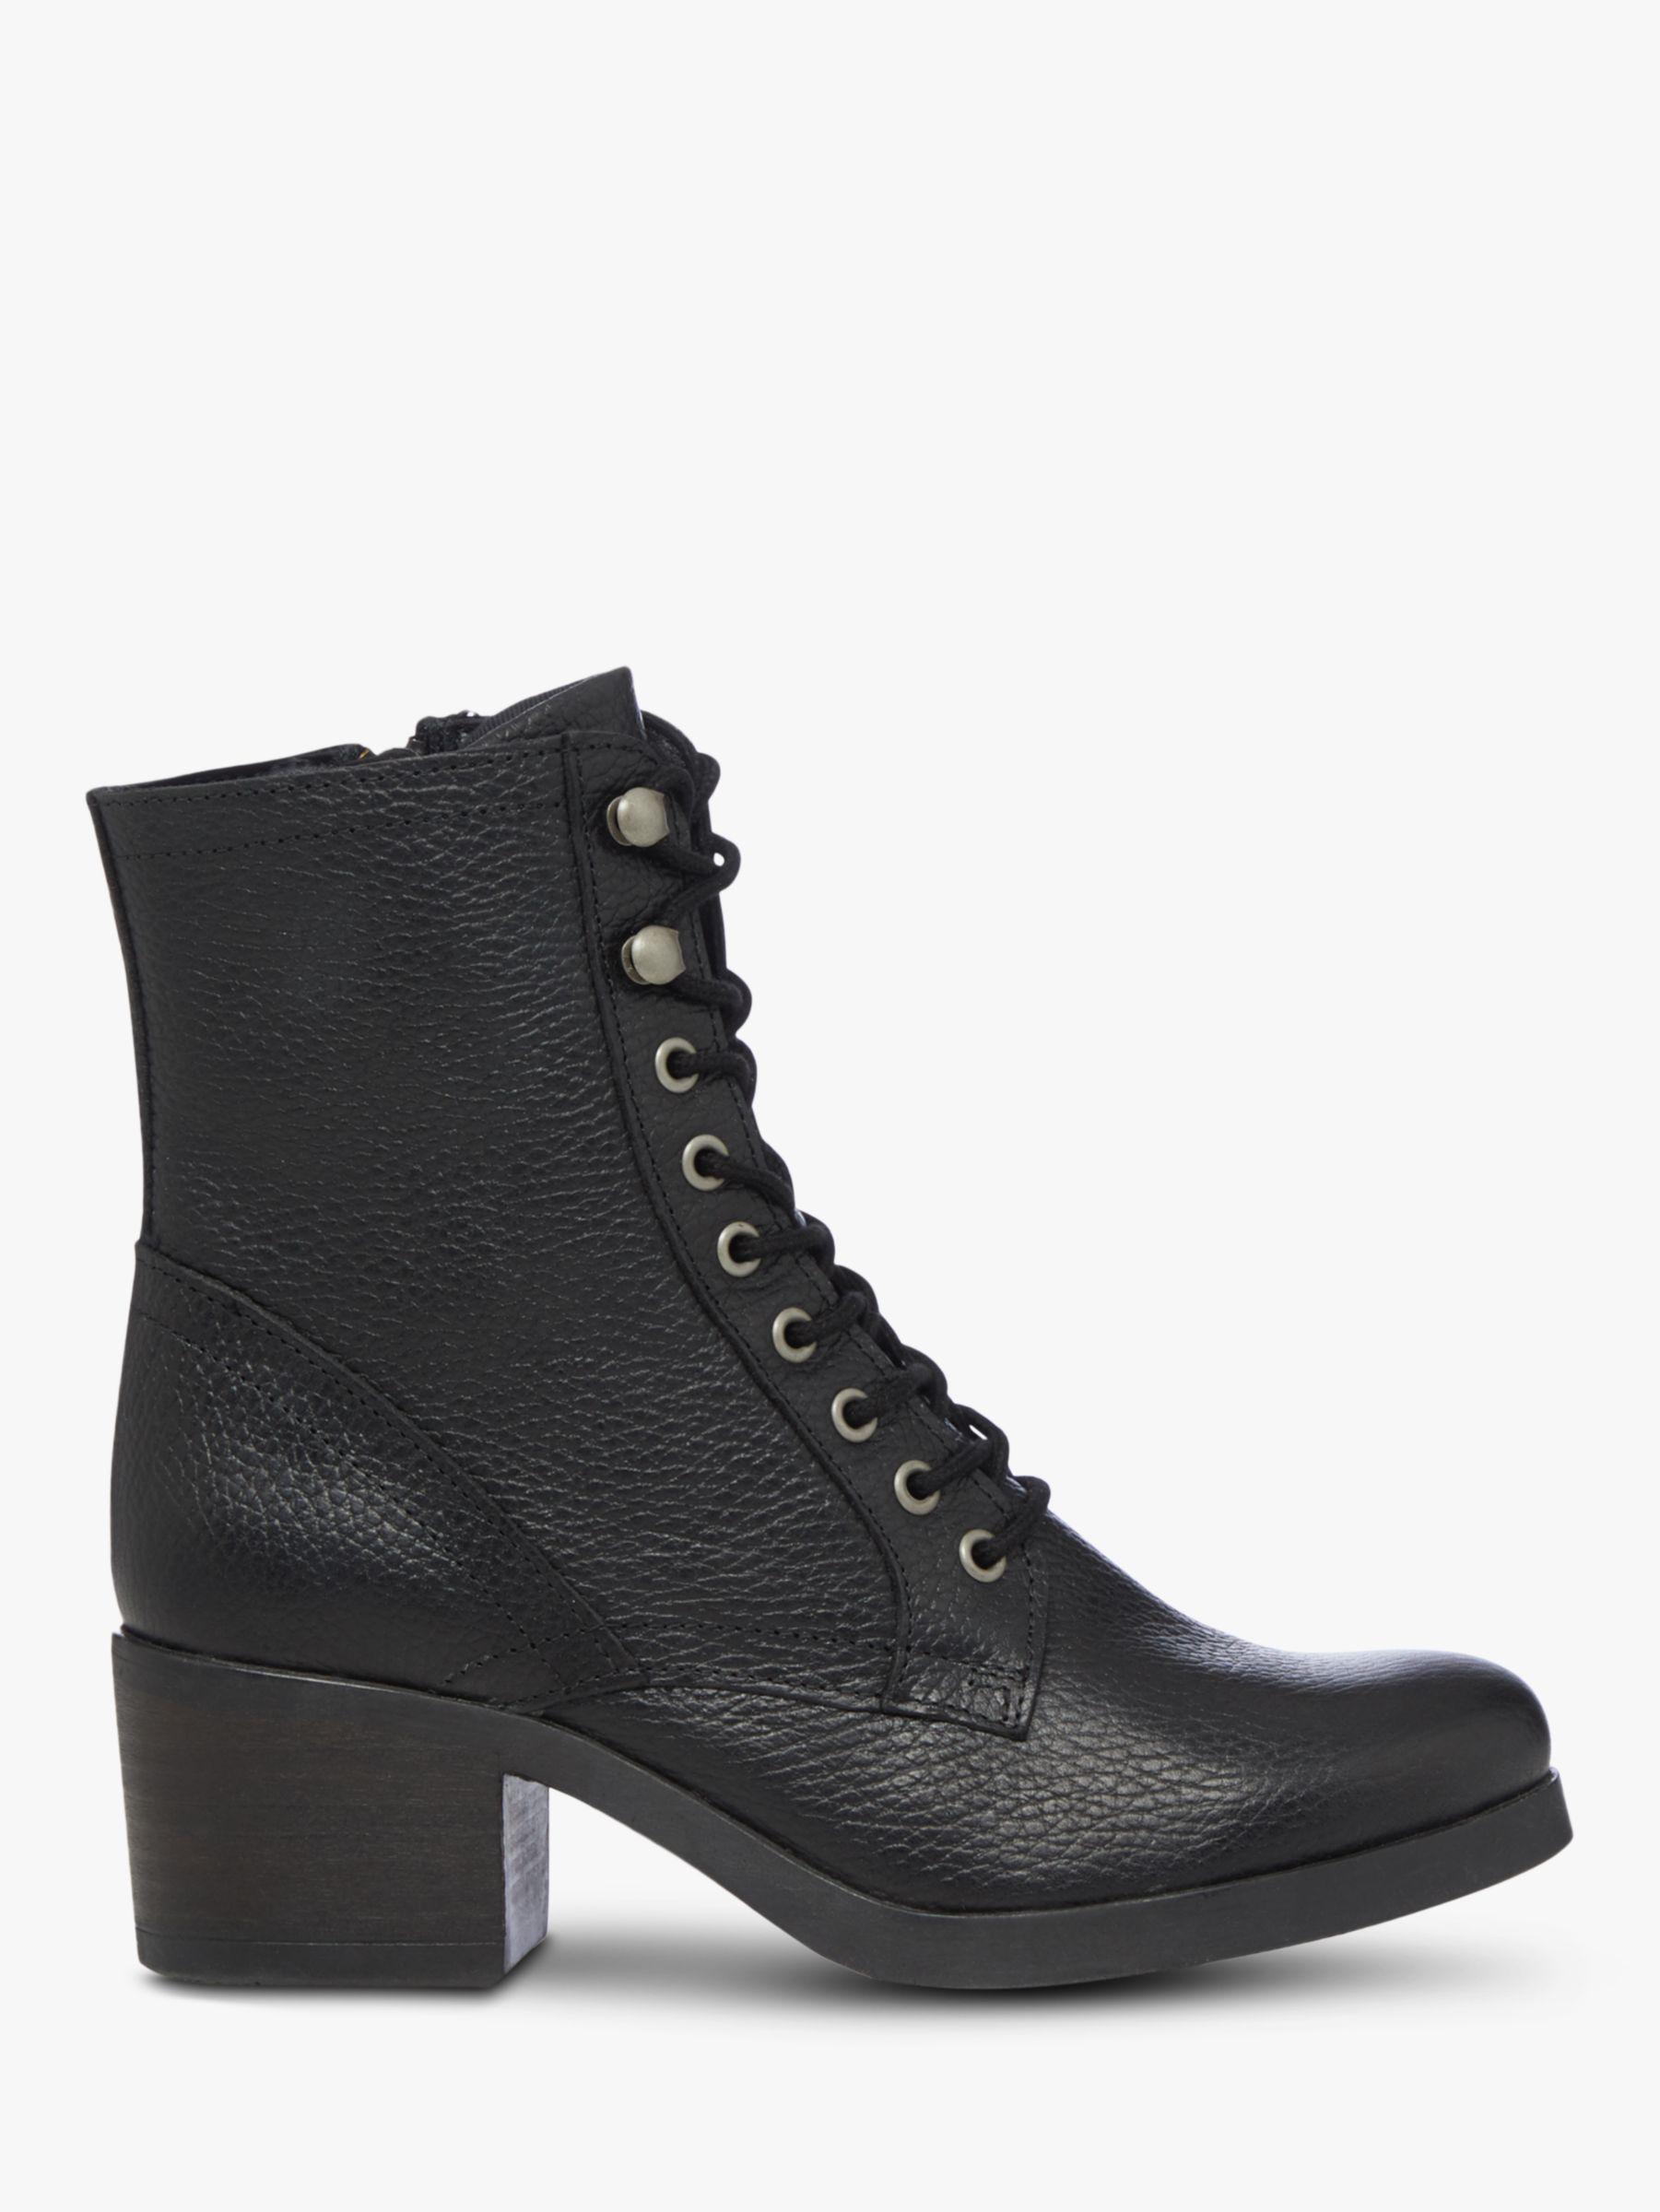 Bertie Bertie Painter Leather Lace Up Ankle Boots